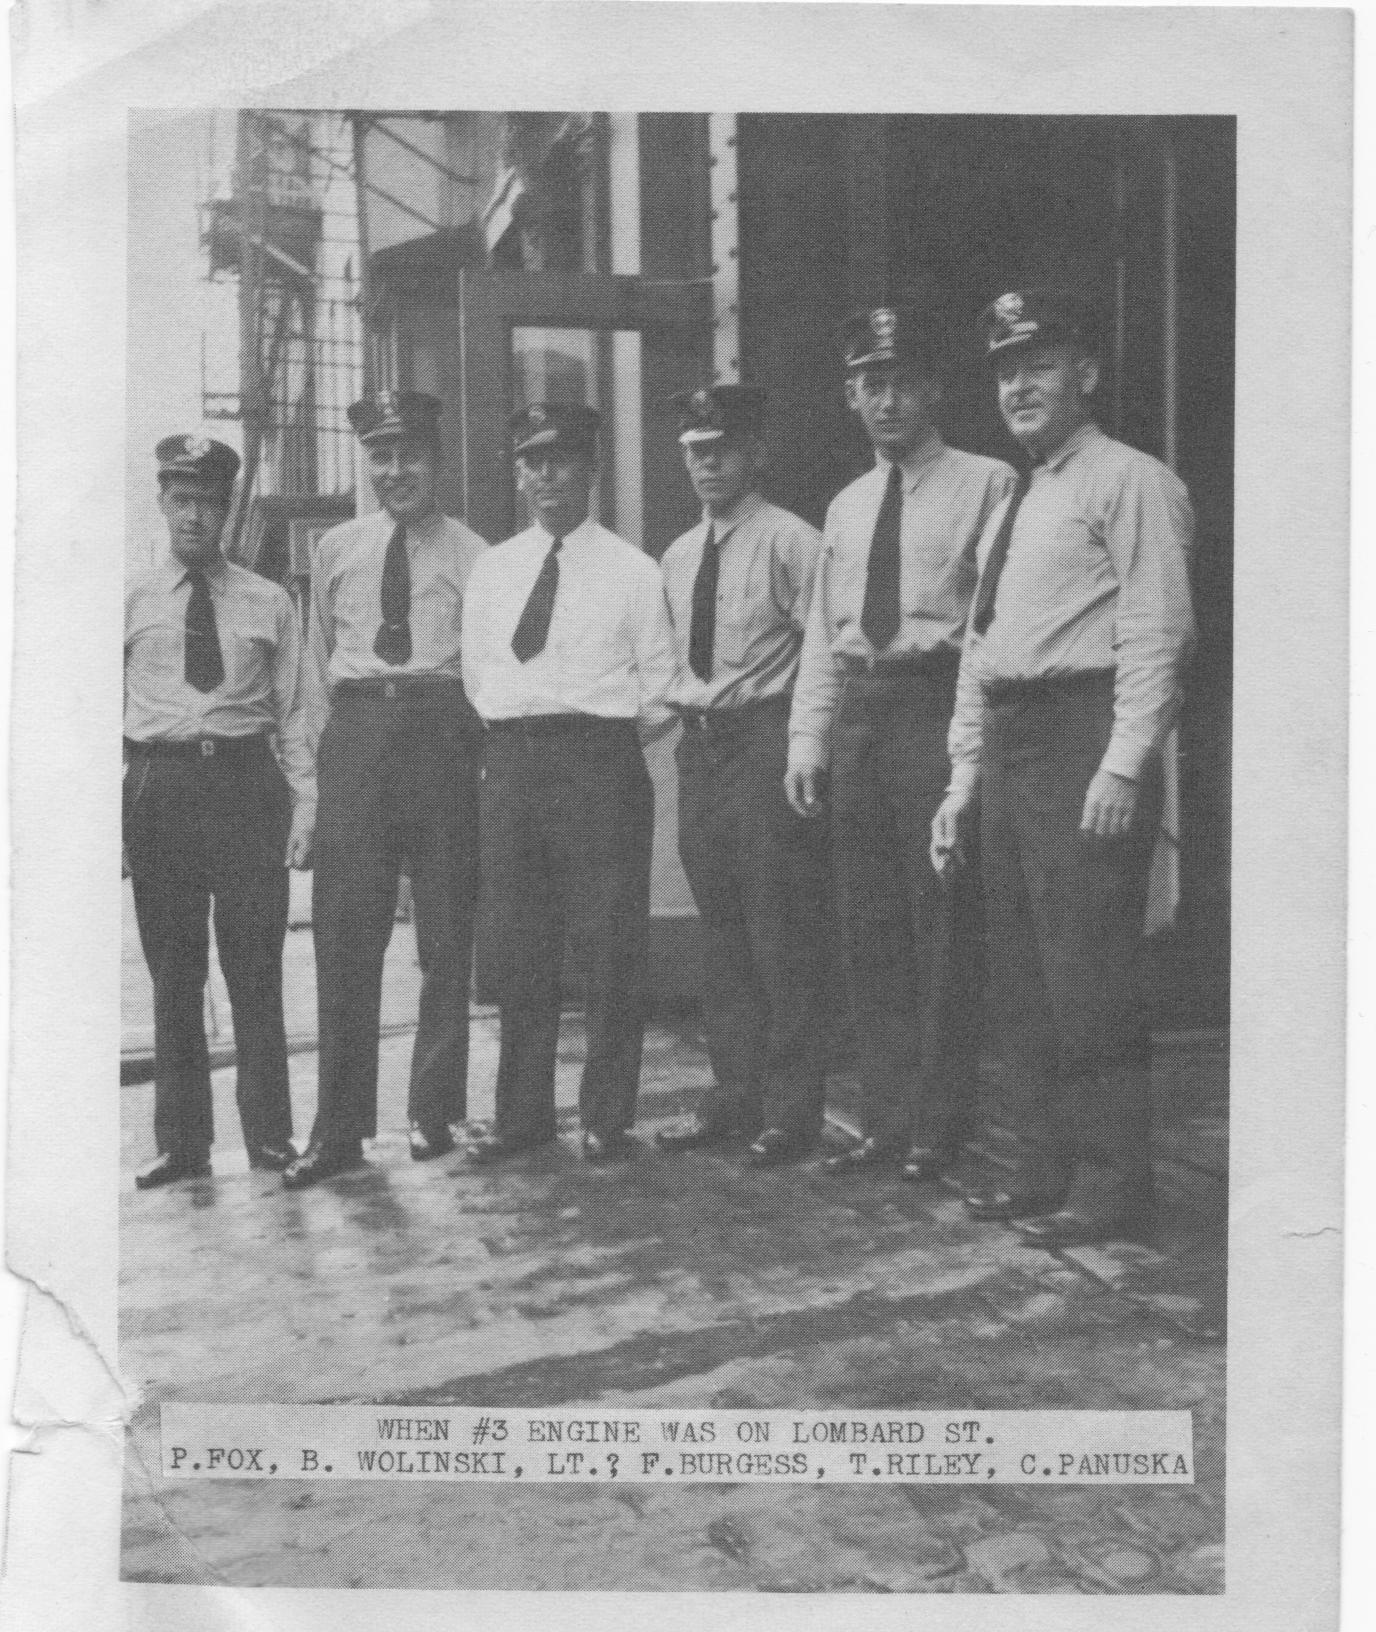 Members-Old_Engine_3-Lombard_Street